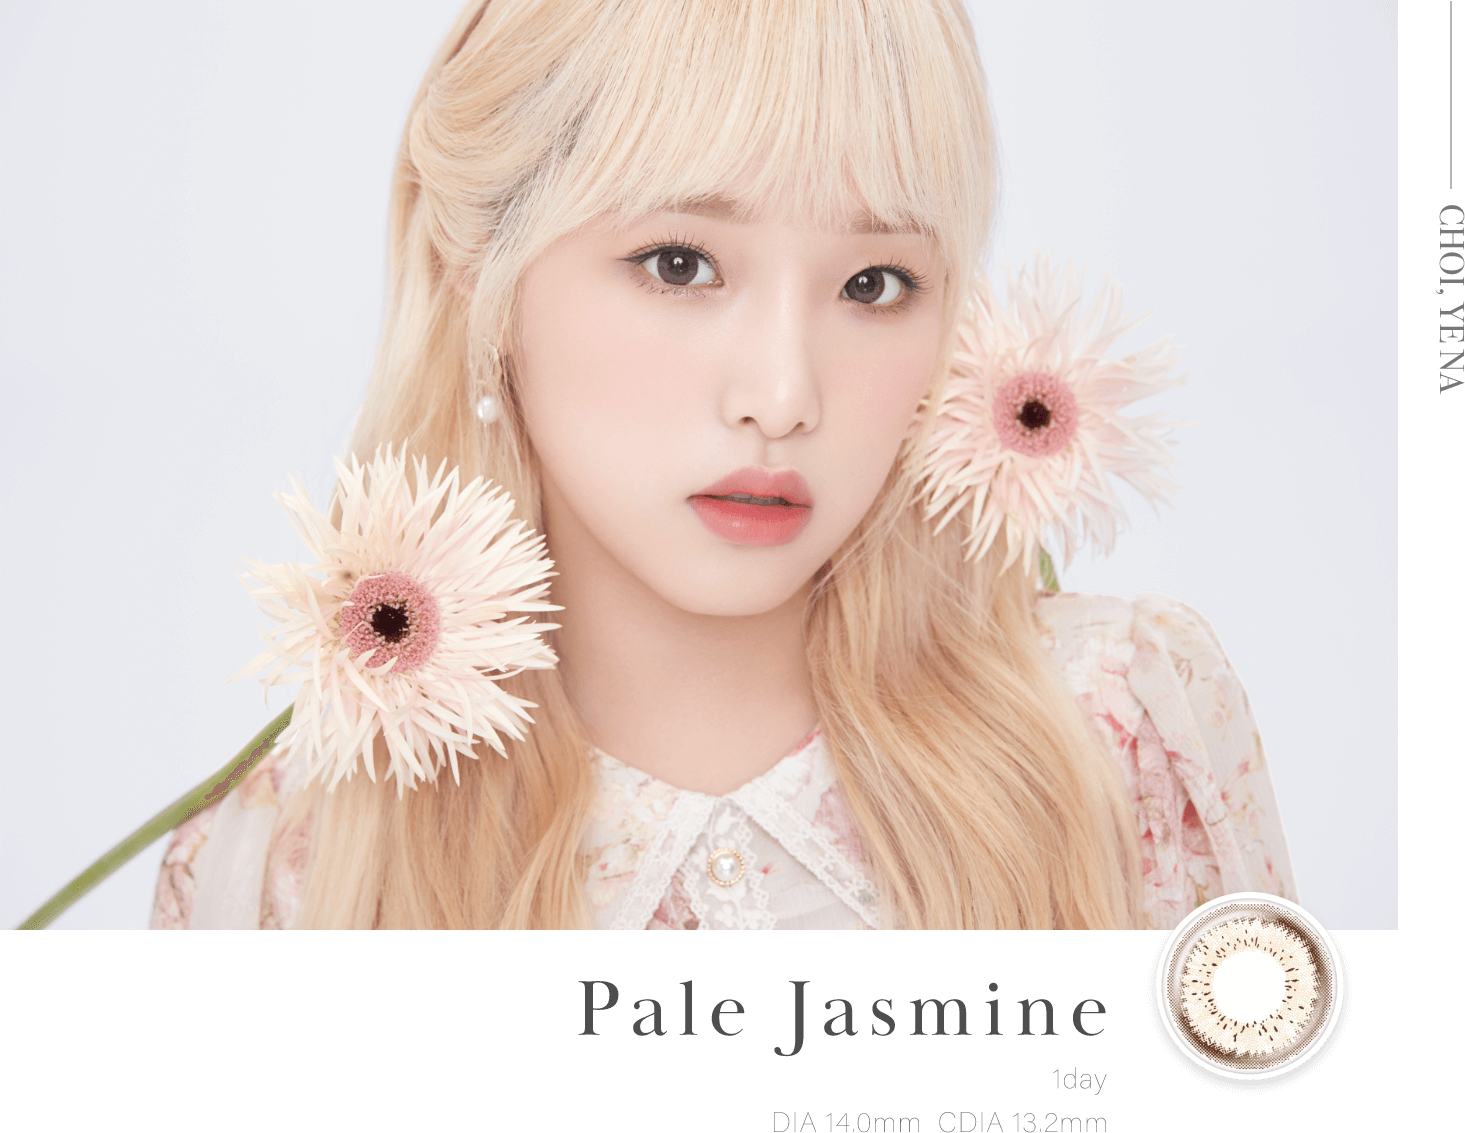 Pale Jasmine